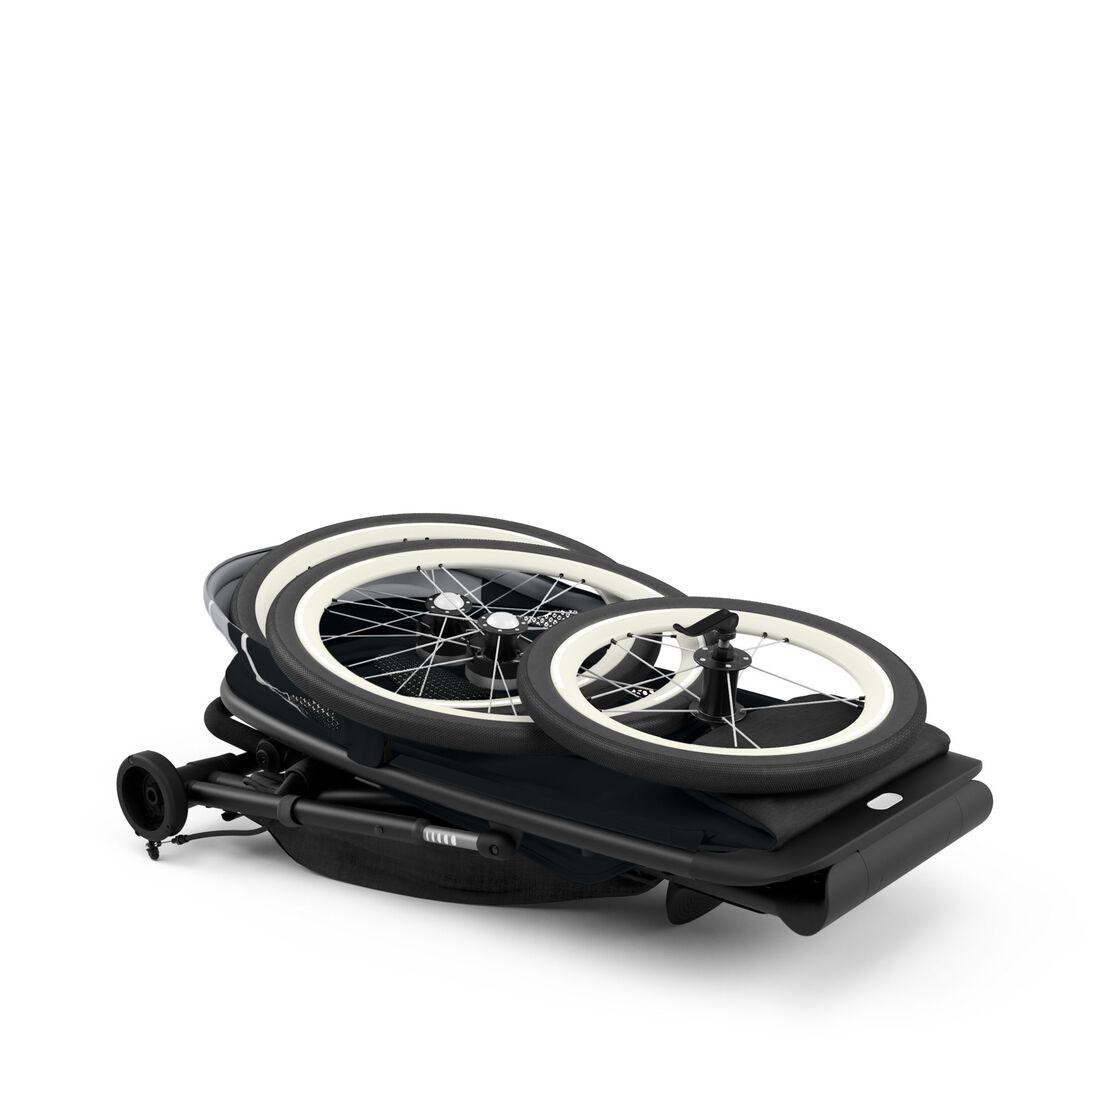 CYBEX Avi Frame - Black With Black Details in Black With Black Details large